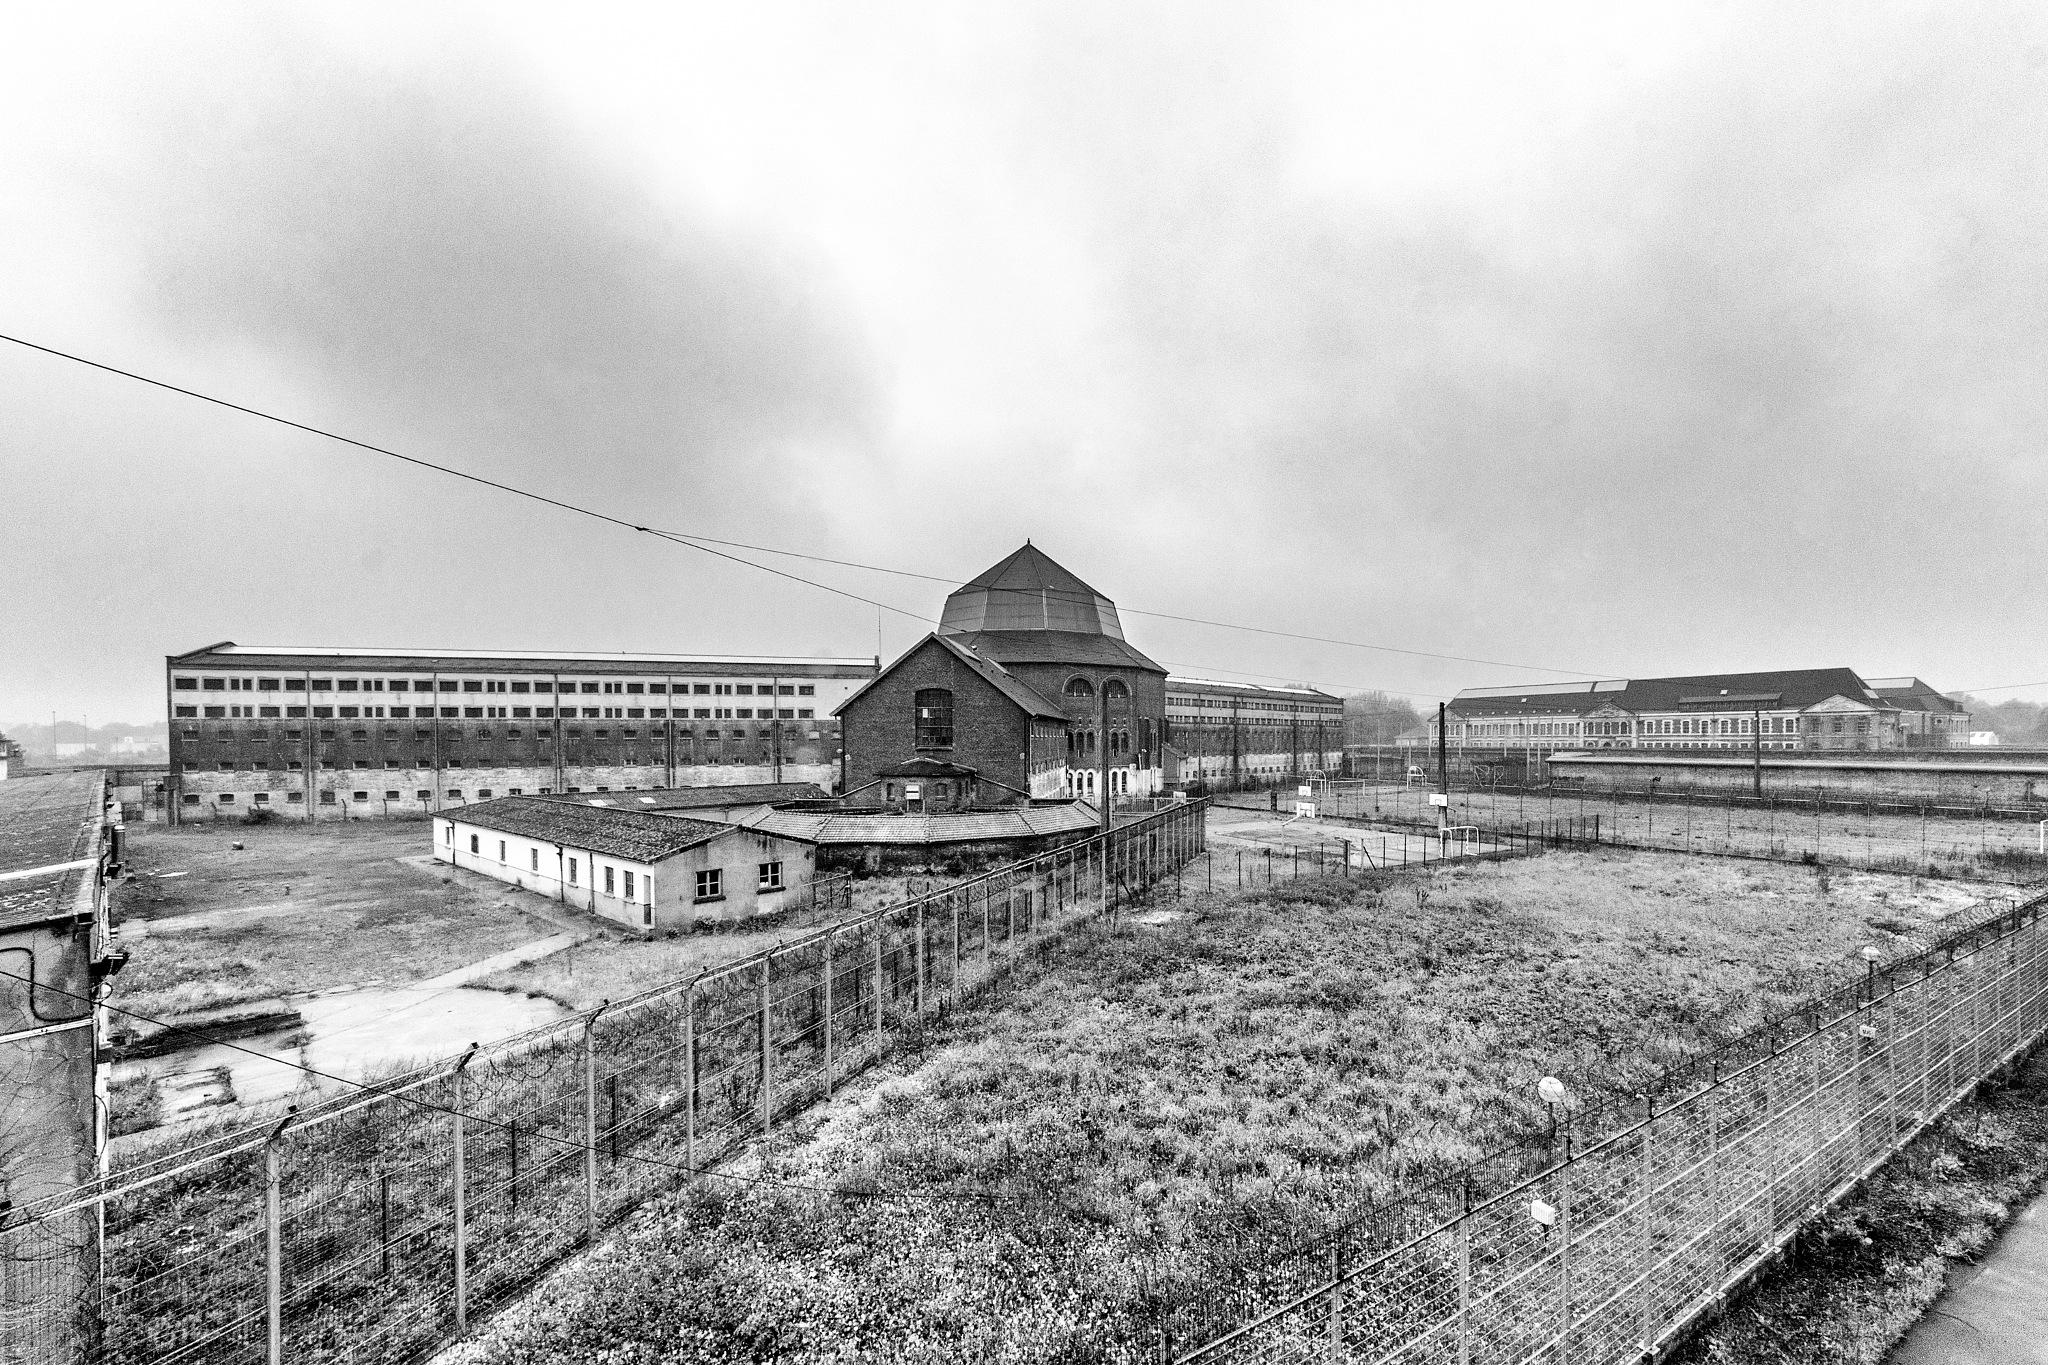 Prison H15 by Bz Photo